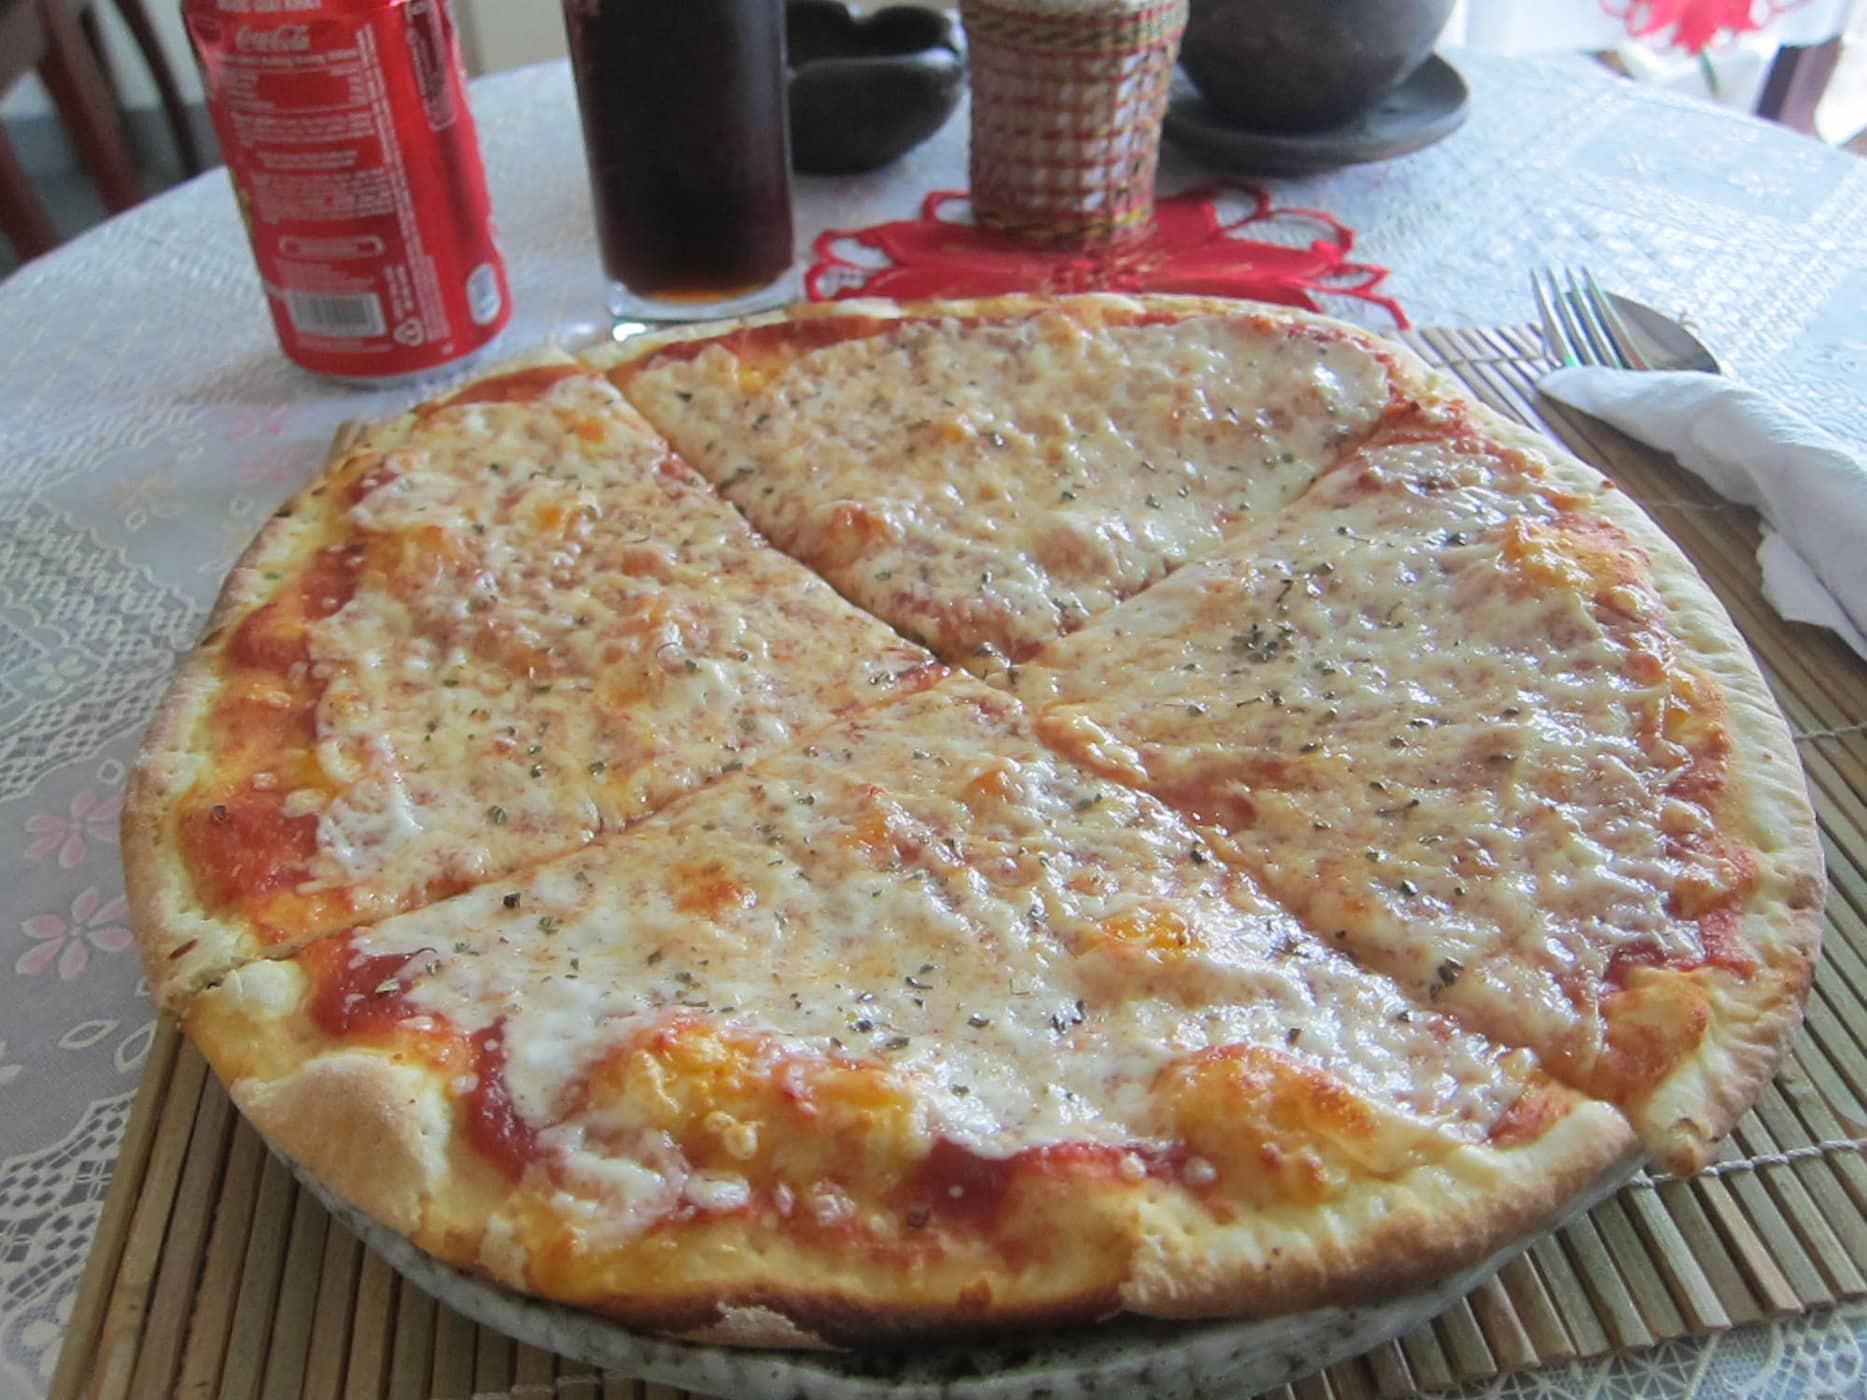 Pizza in Nha Trang, Vietnam